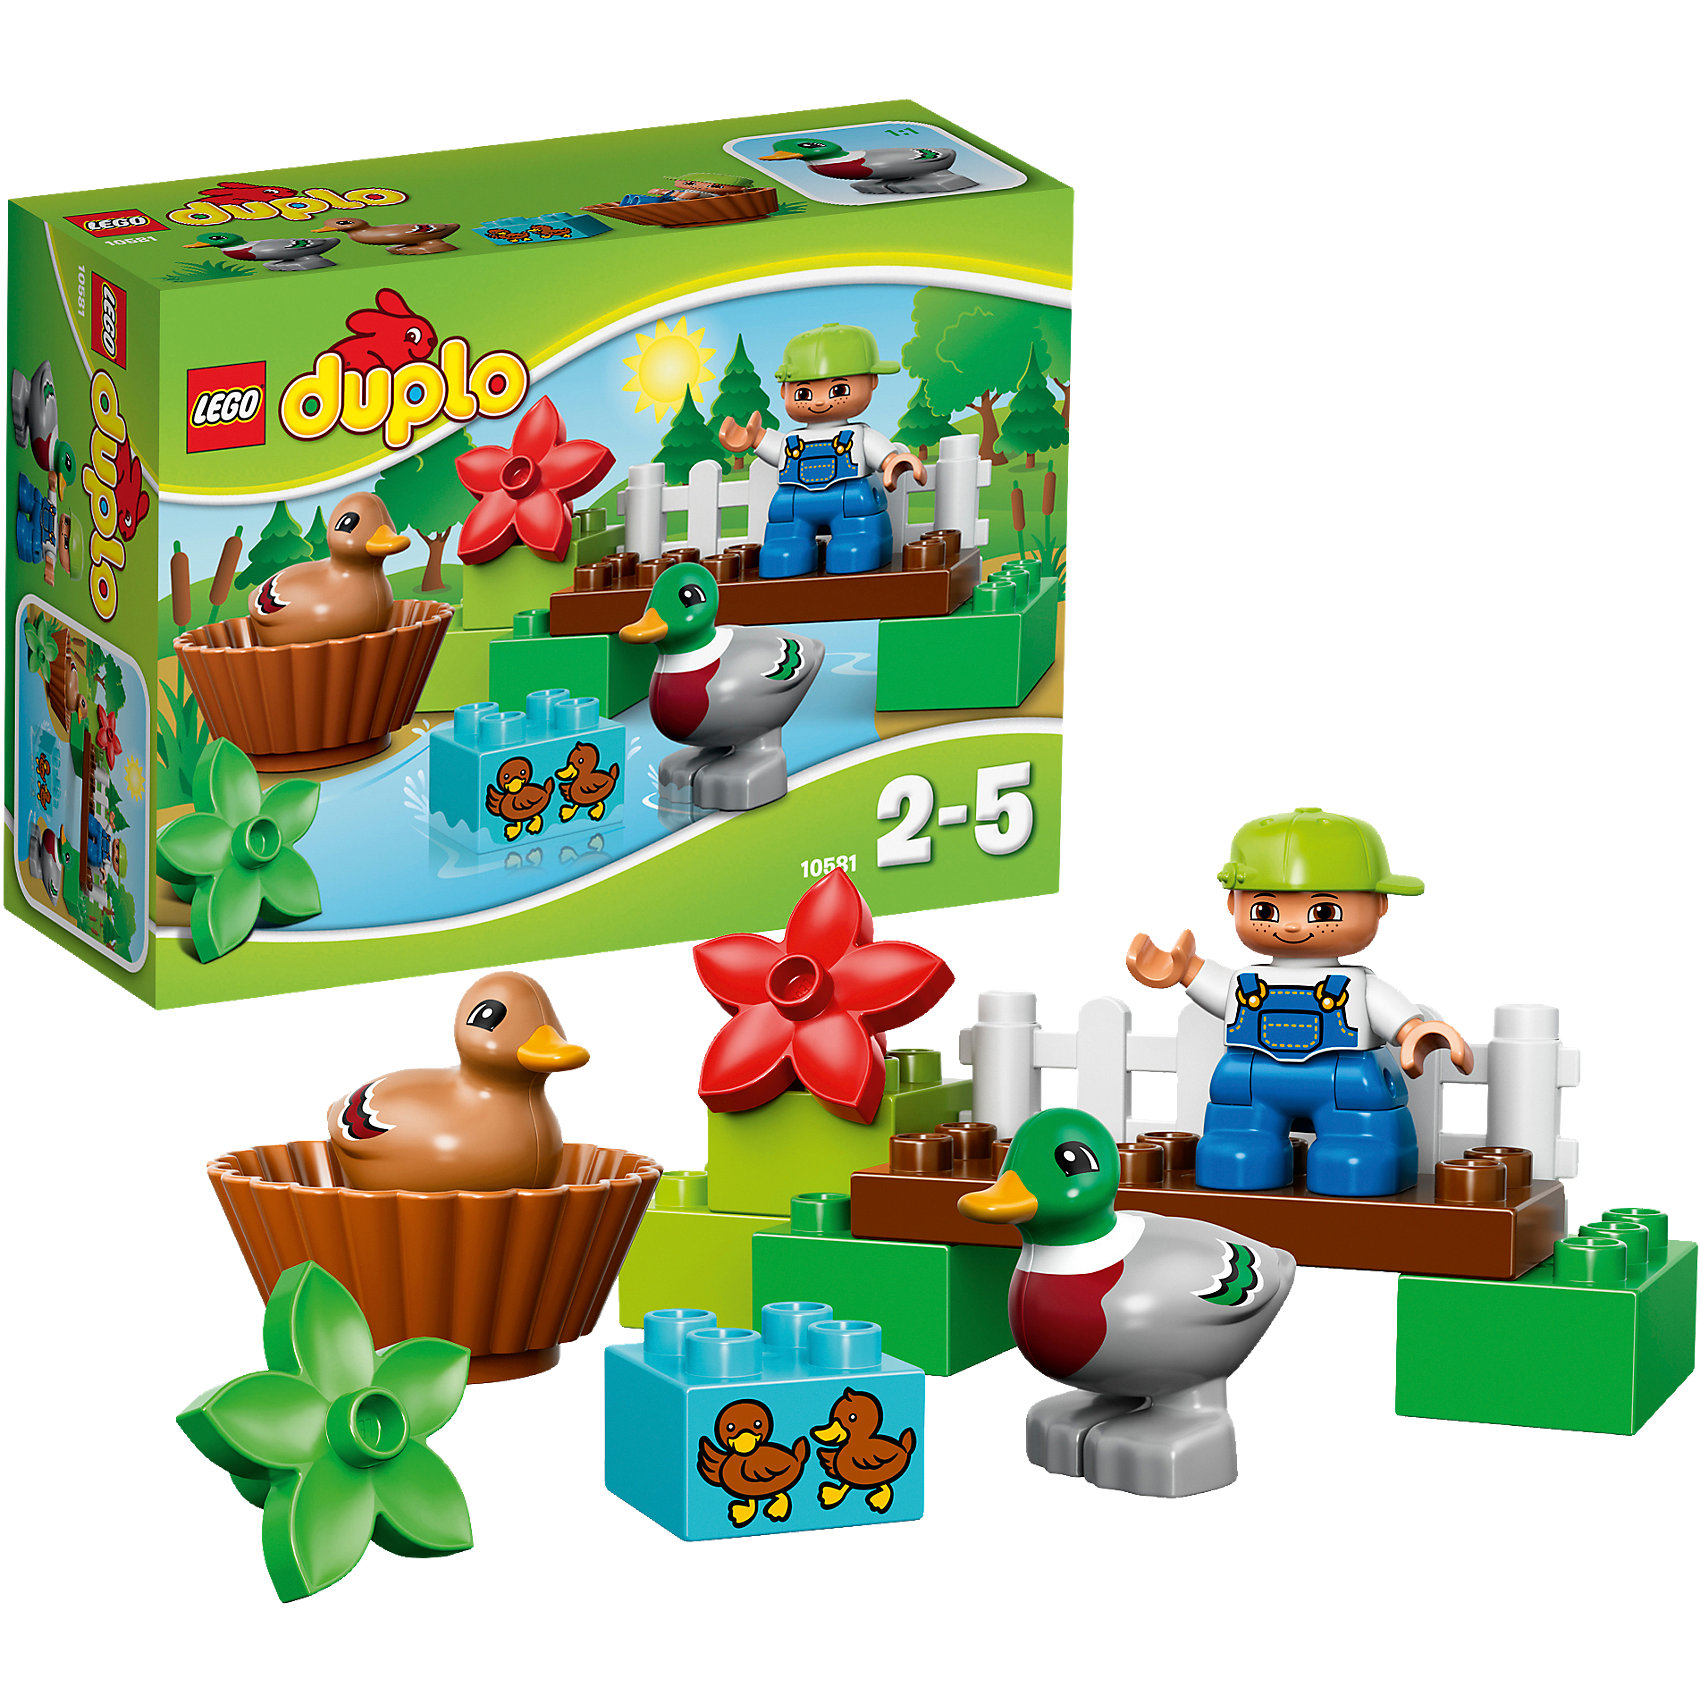 лего дупло гусеница LEGO LEGO DUPLO 10581: Уточки в лесу